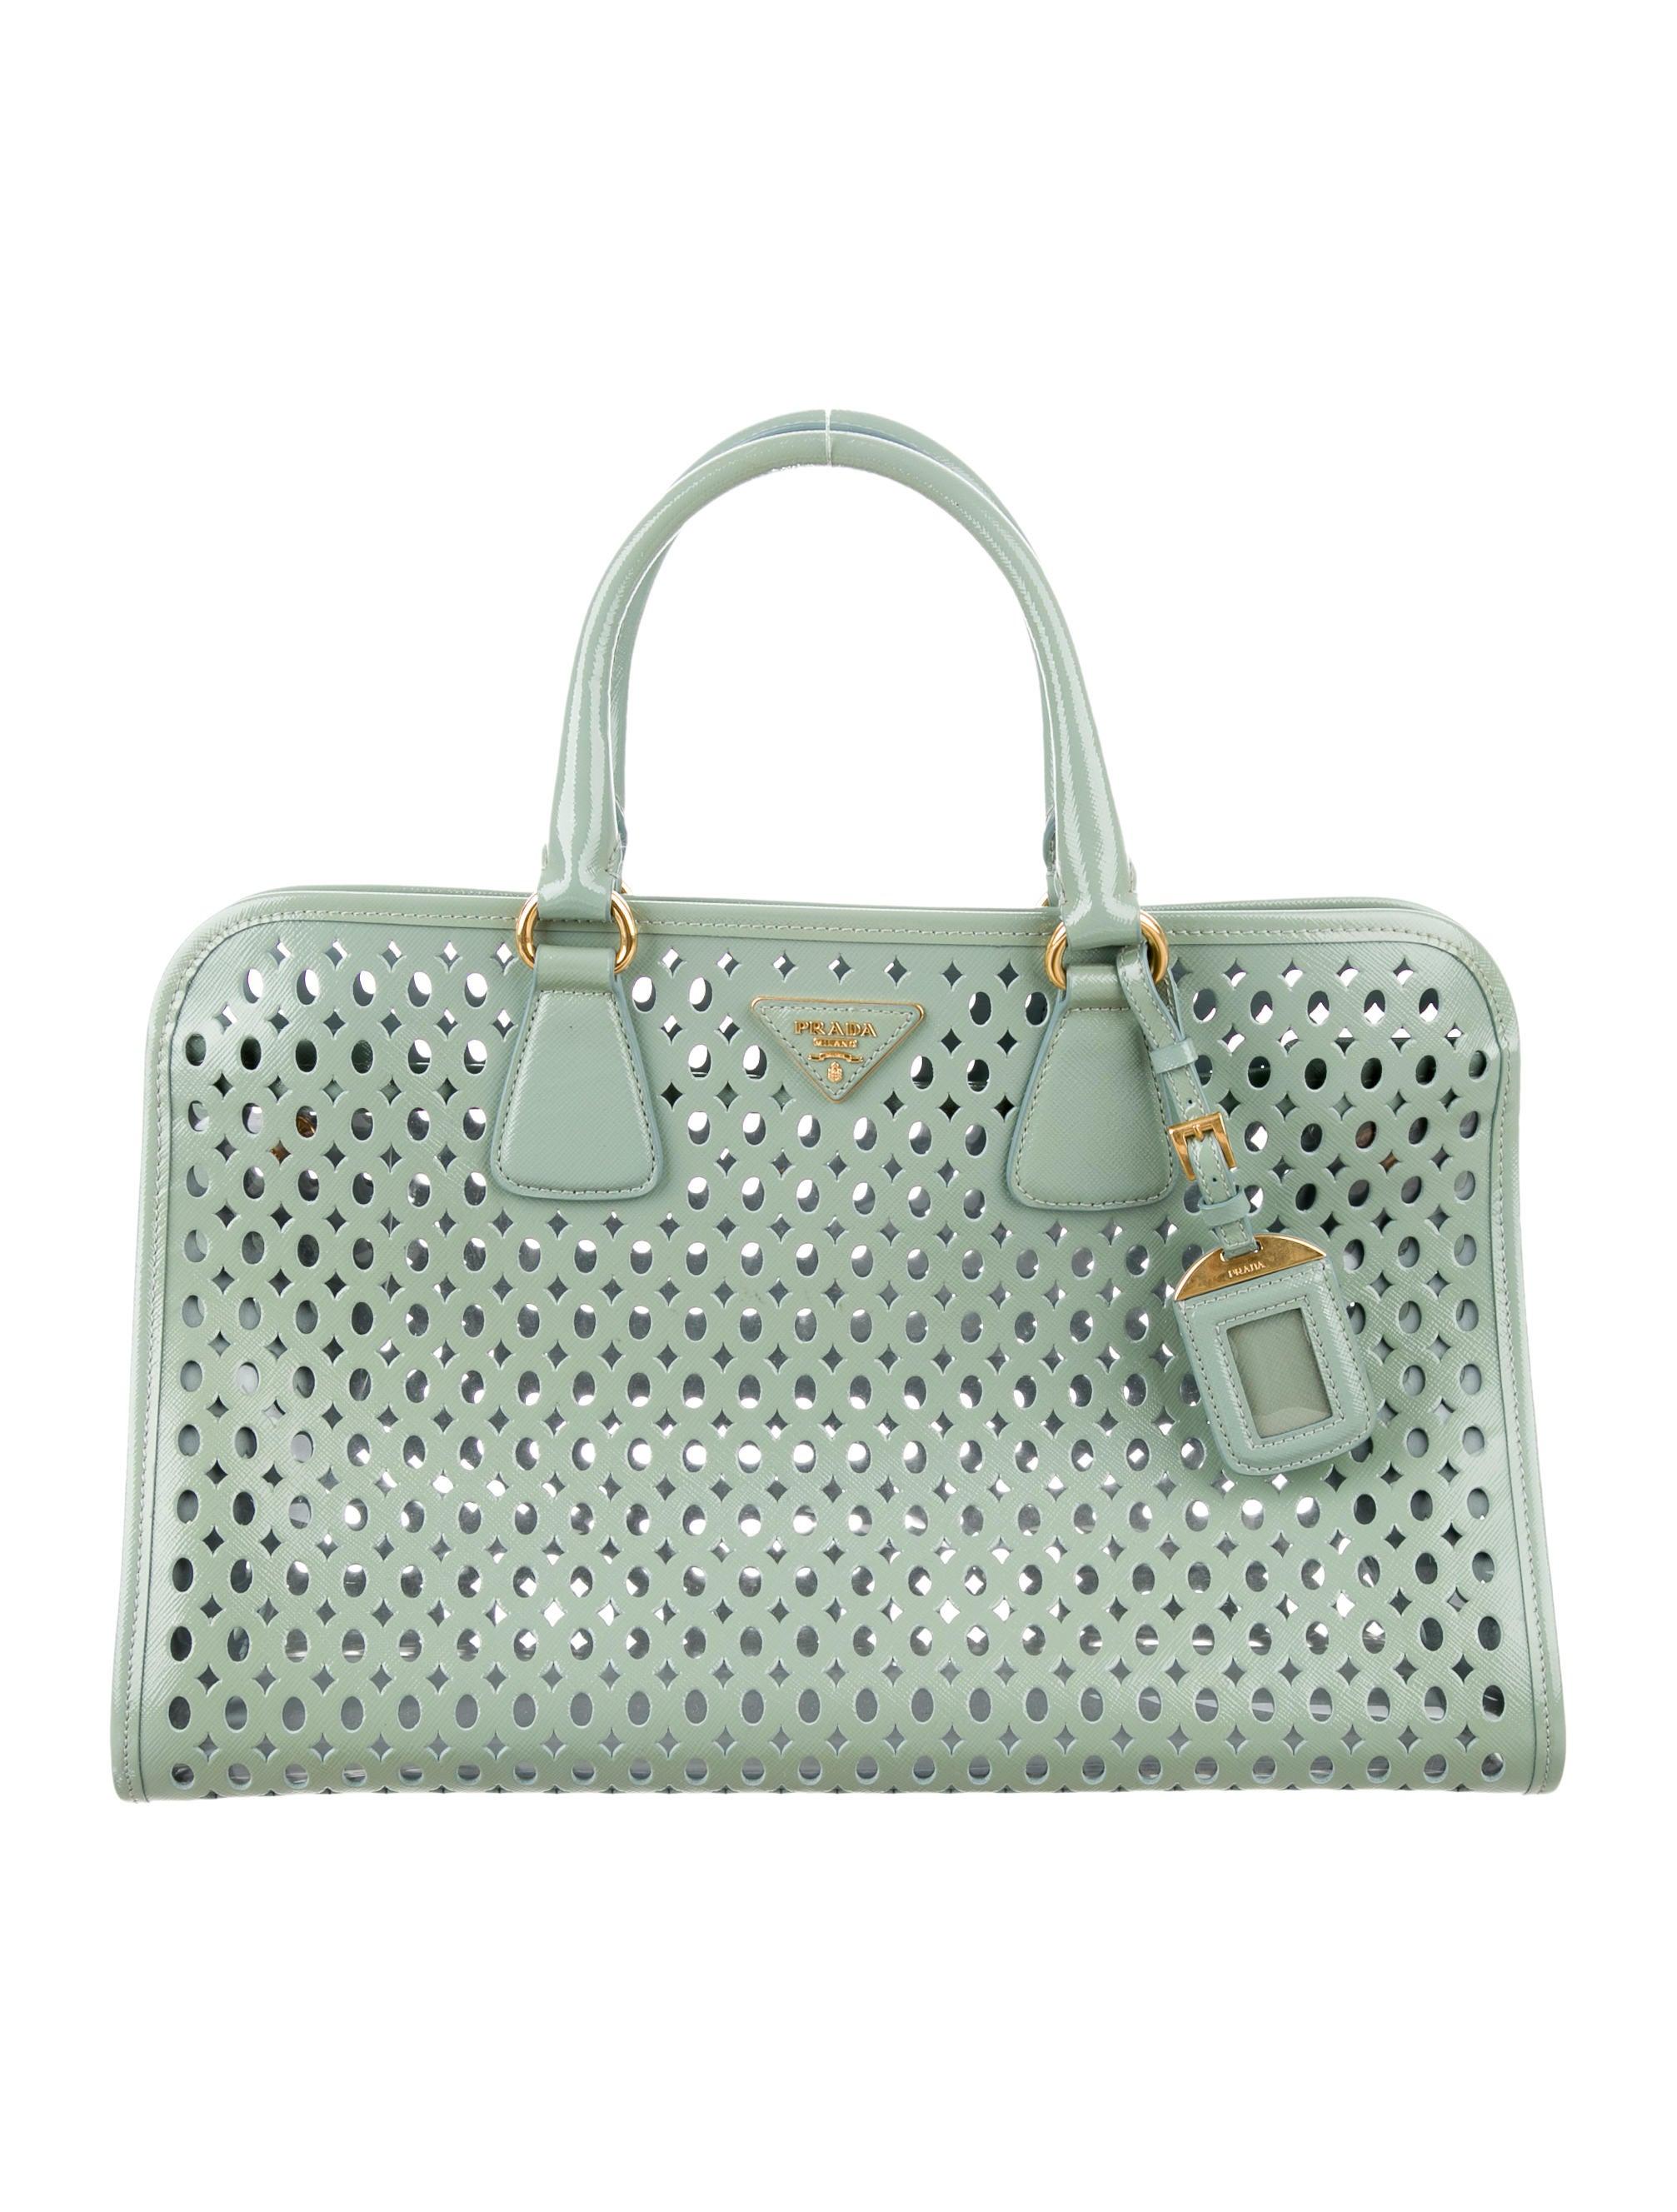 74c51b491e7b Prada Saffiano Vernice Fori Tote - Handbags - PRA173424 | The RealReal